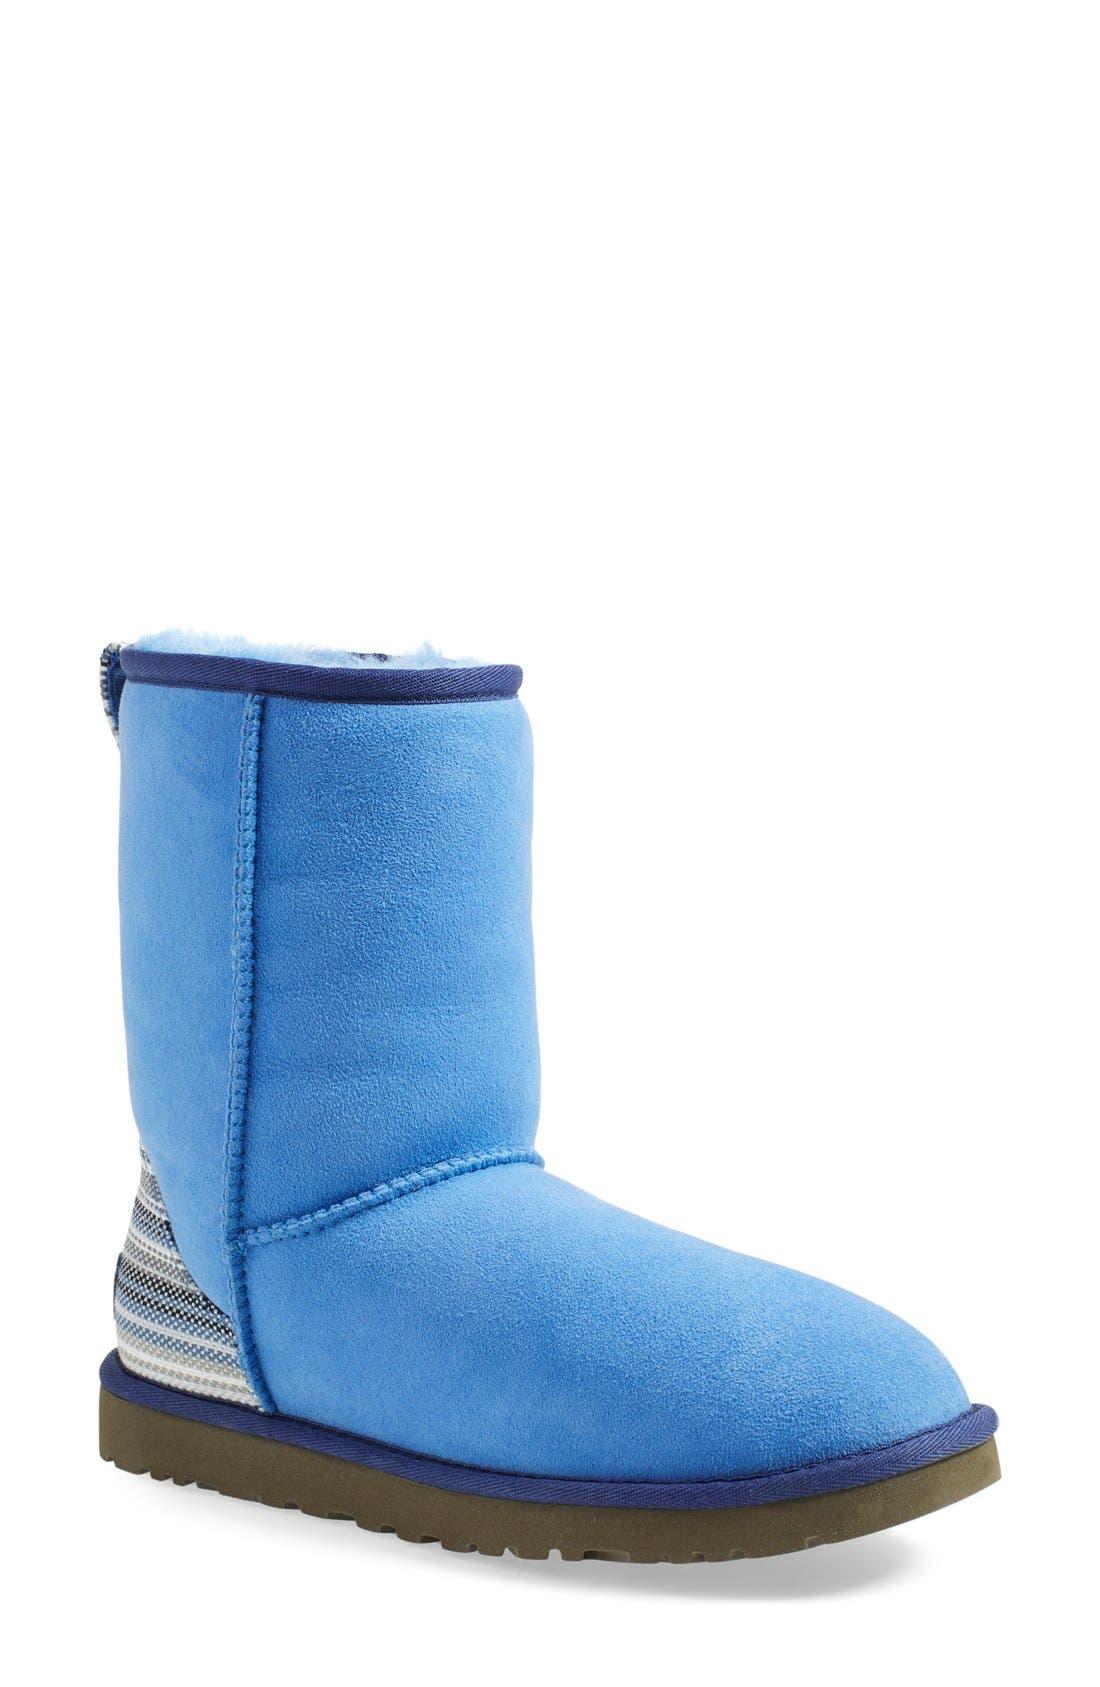 Main Image - UGG® 'Classic Short - Serape' Water Resistant Boot (Women)